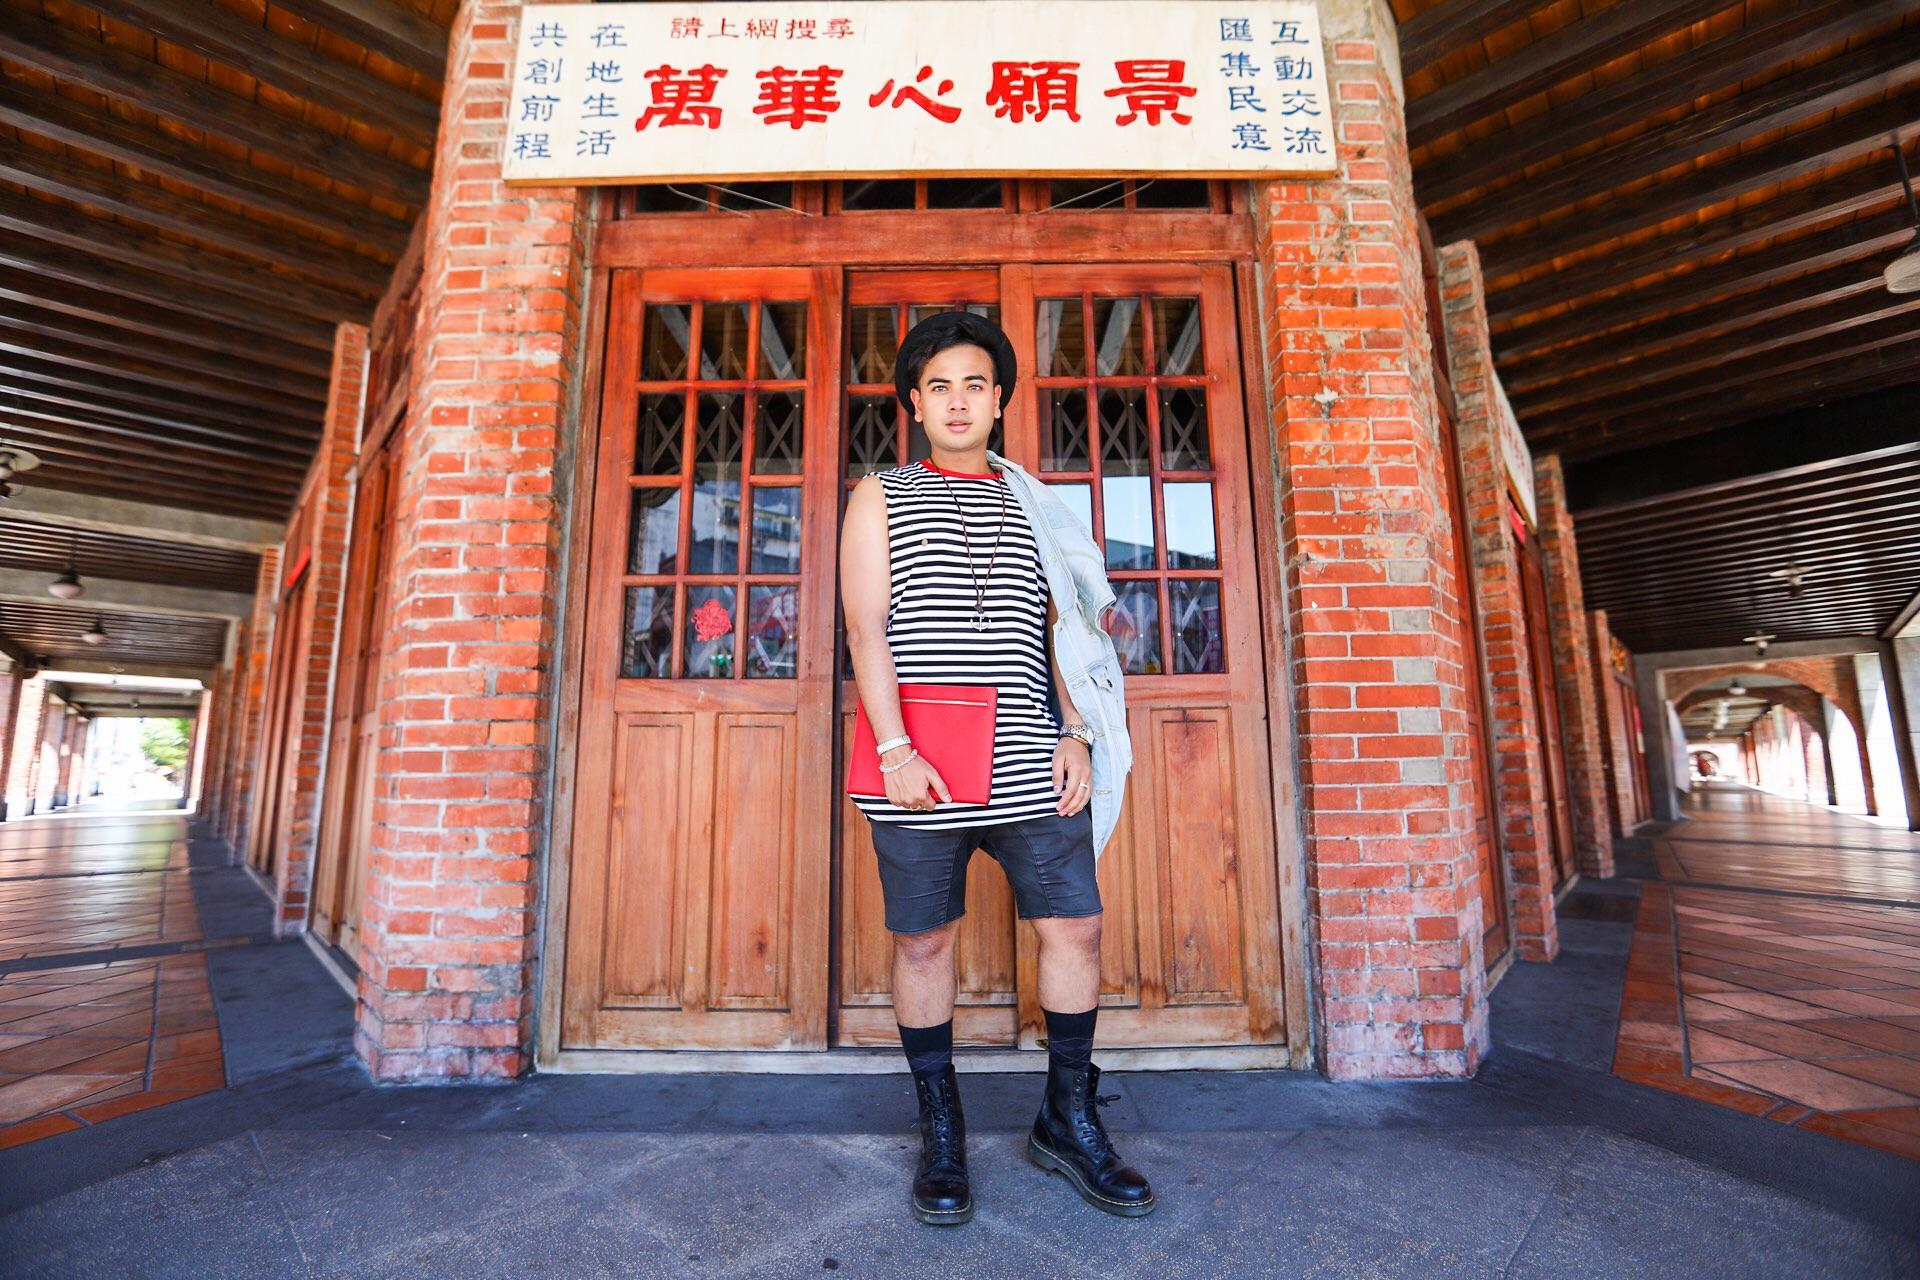 Dihua Street Taiwan + History of Taiwan + Streetstyle Star+ Fashion Icon Canada + Mens Fashion + Travel in Style + Visit Taiwan + Elle Taiwan + Vogue Taiwan + Fashion Blogger + Influencer +www.waichingswall.com_1